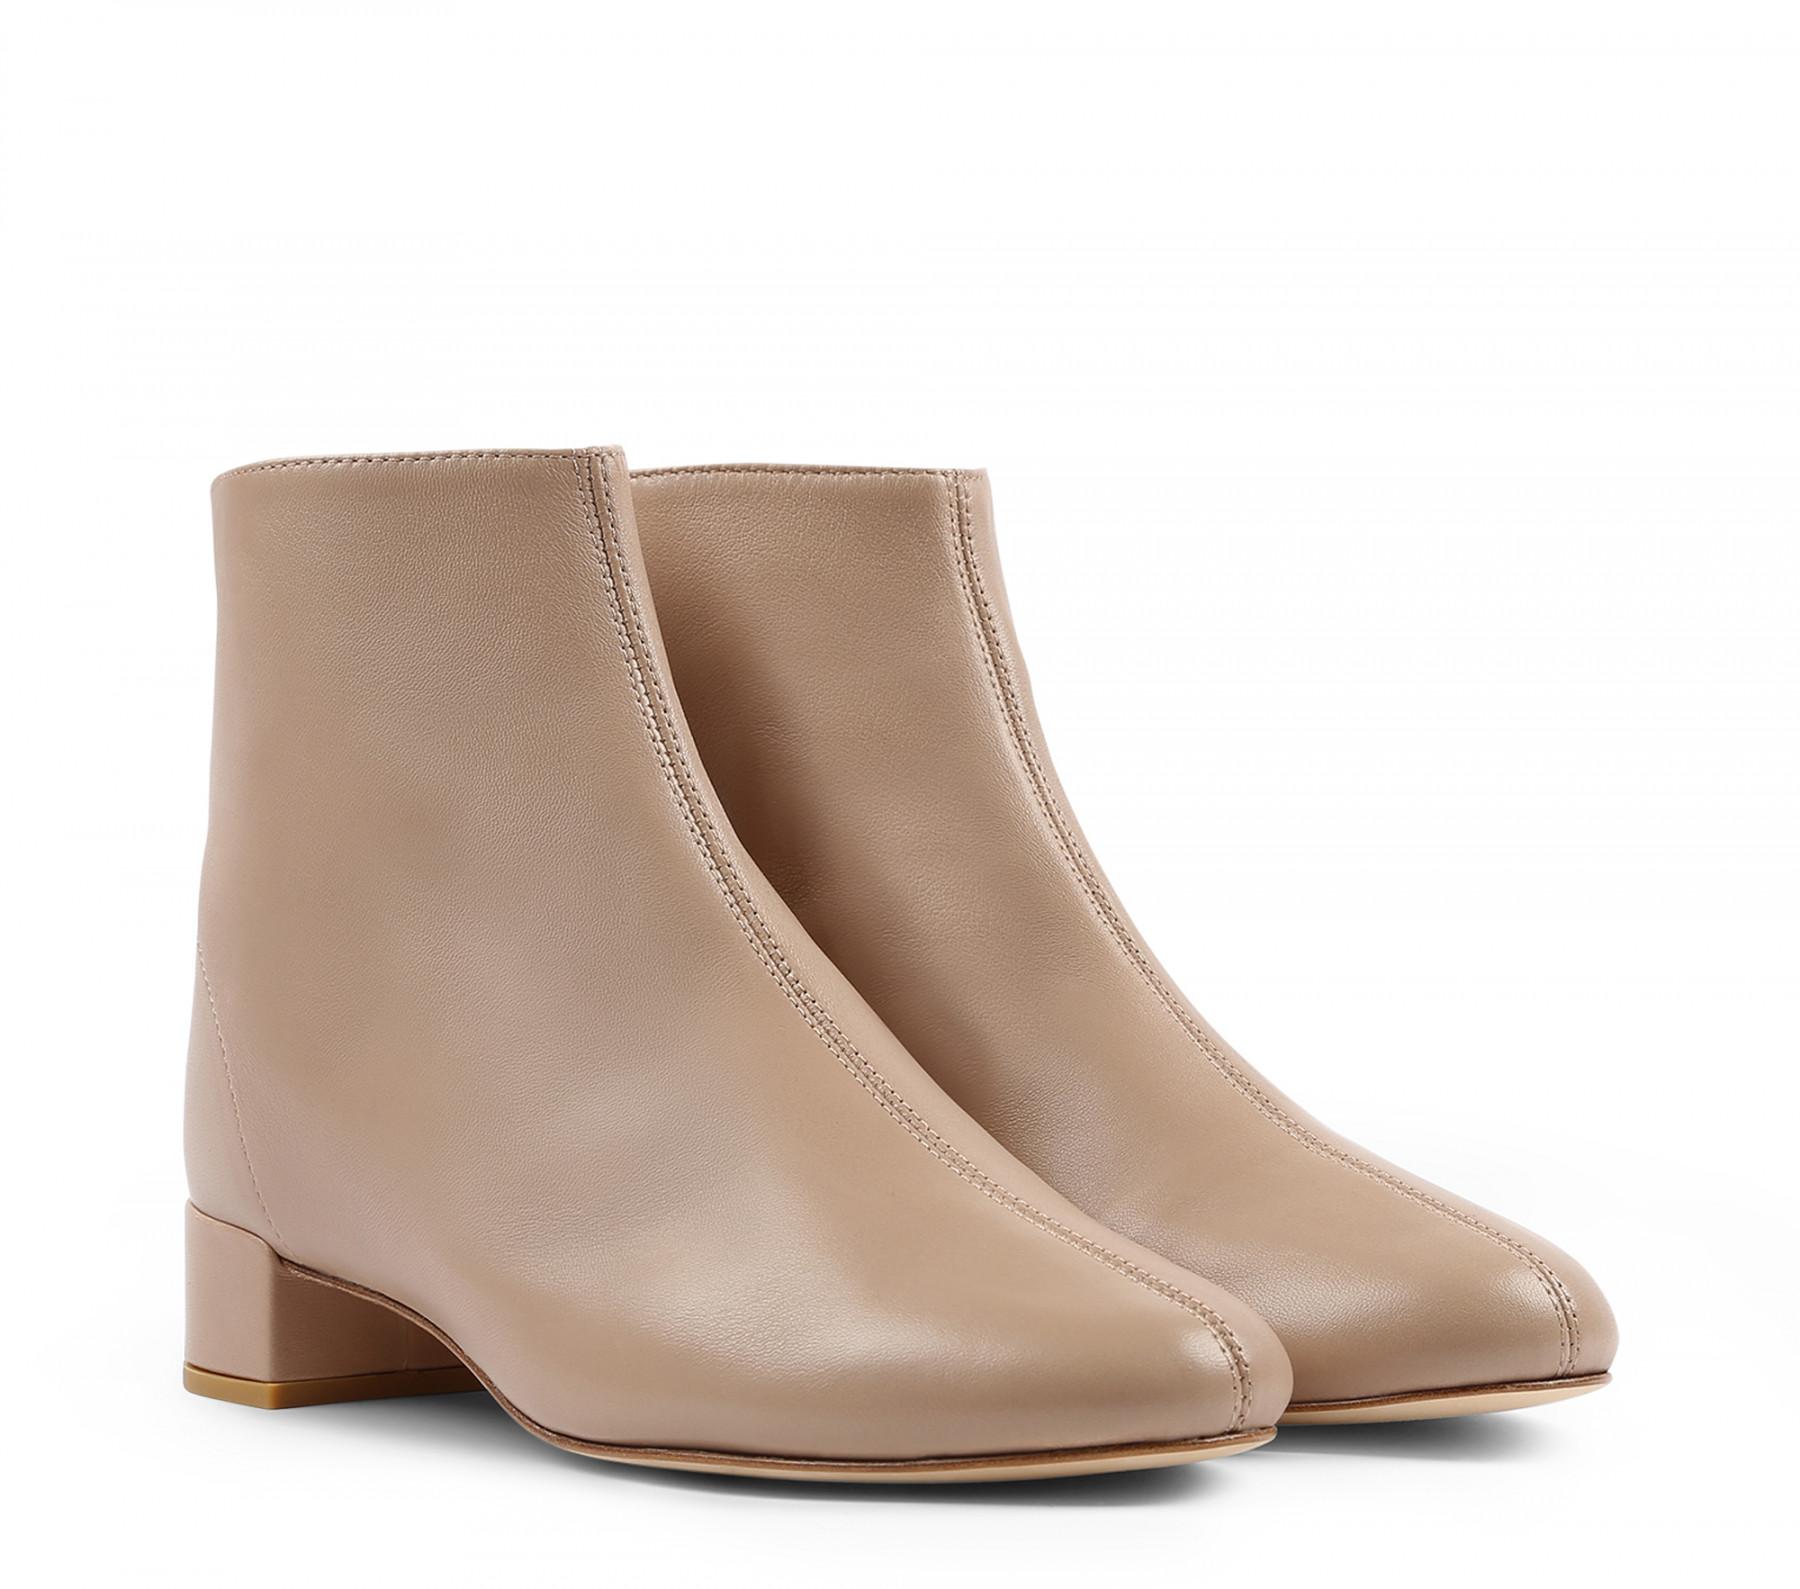 Jolaine ankle boots